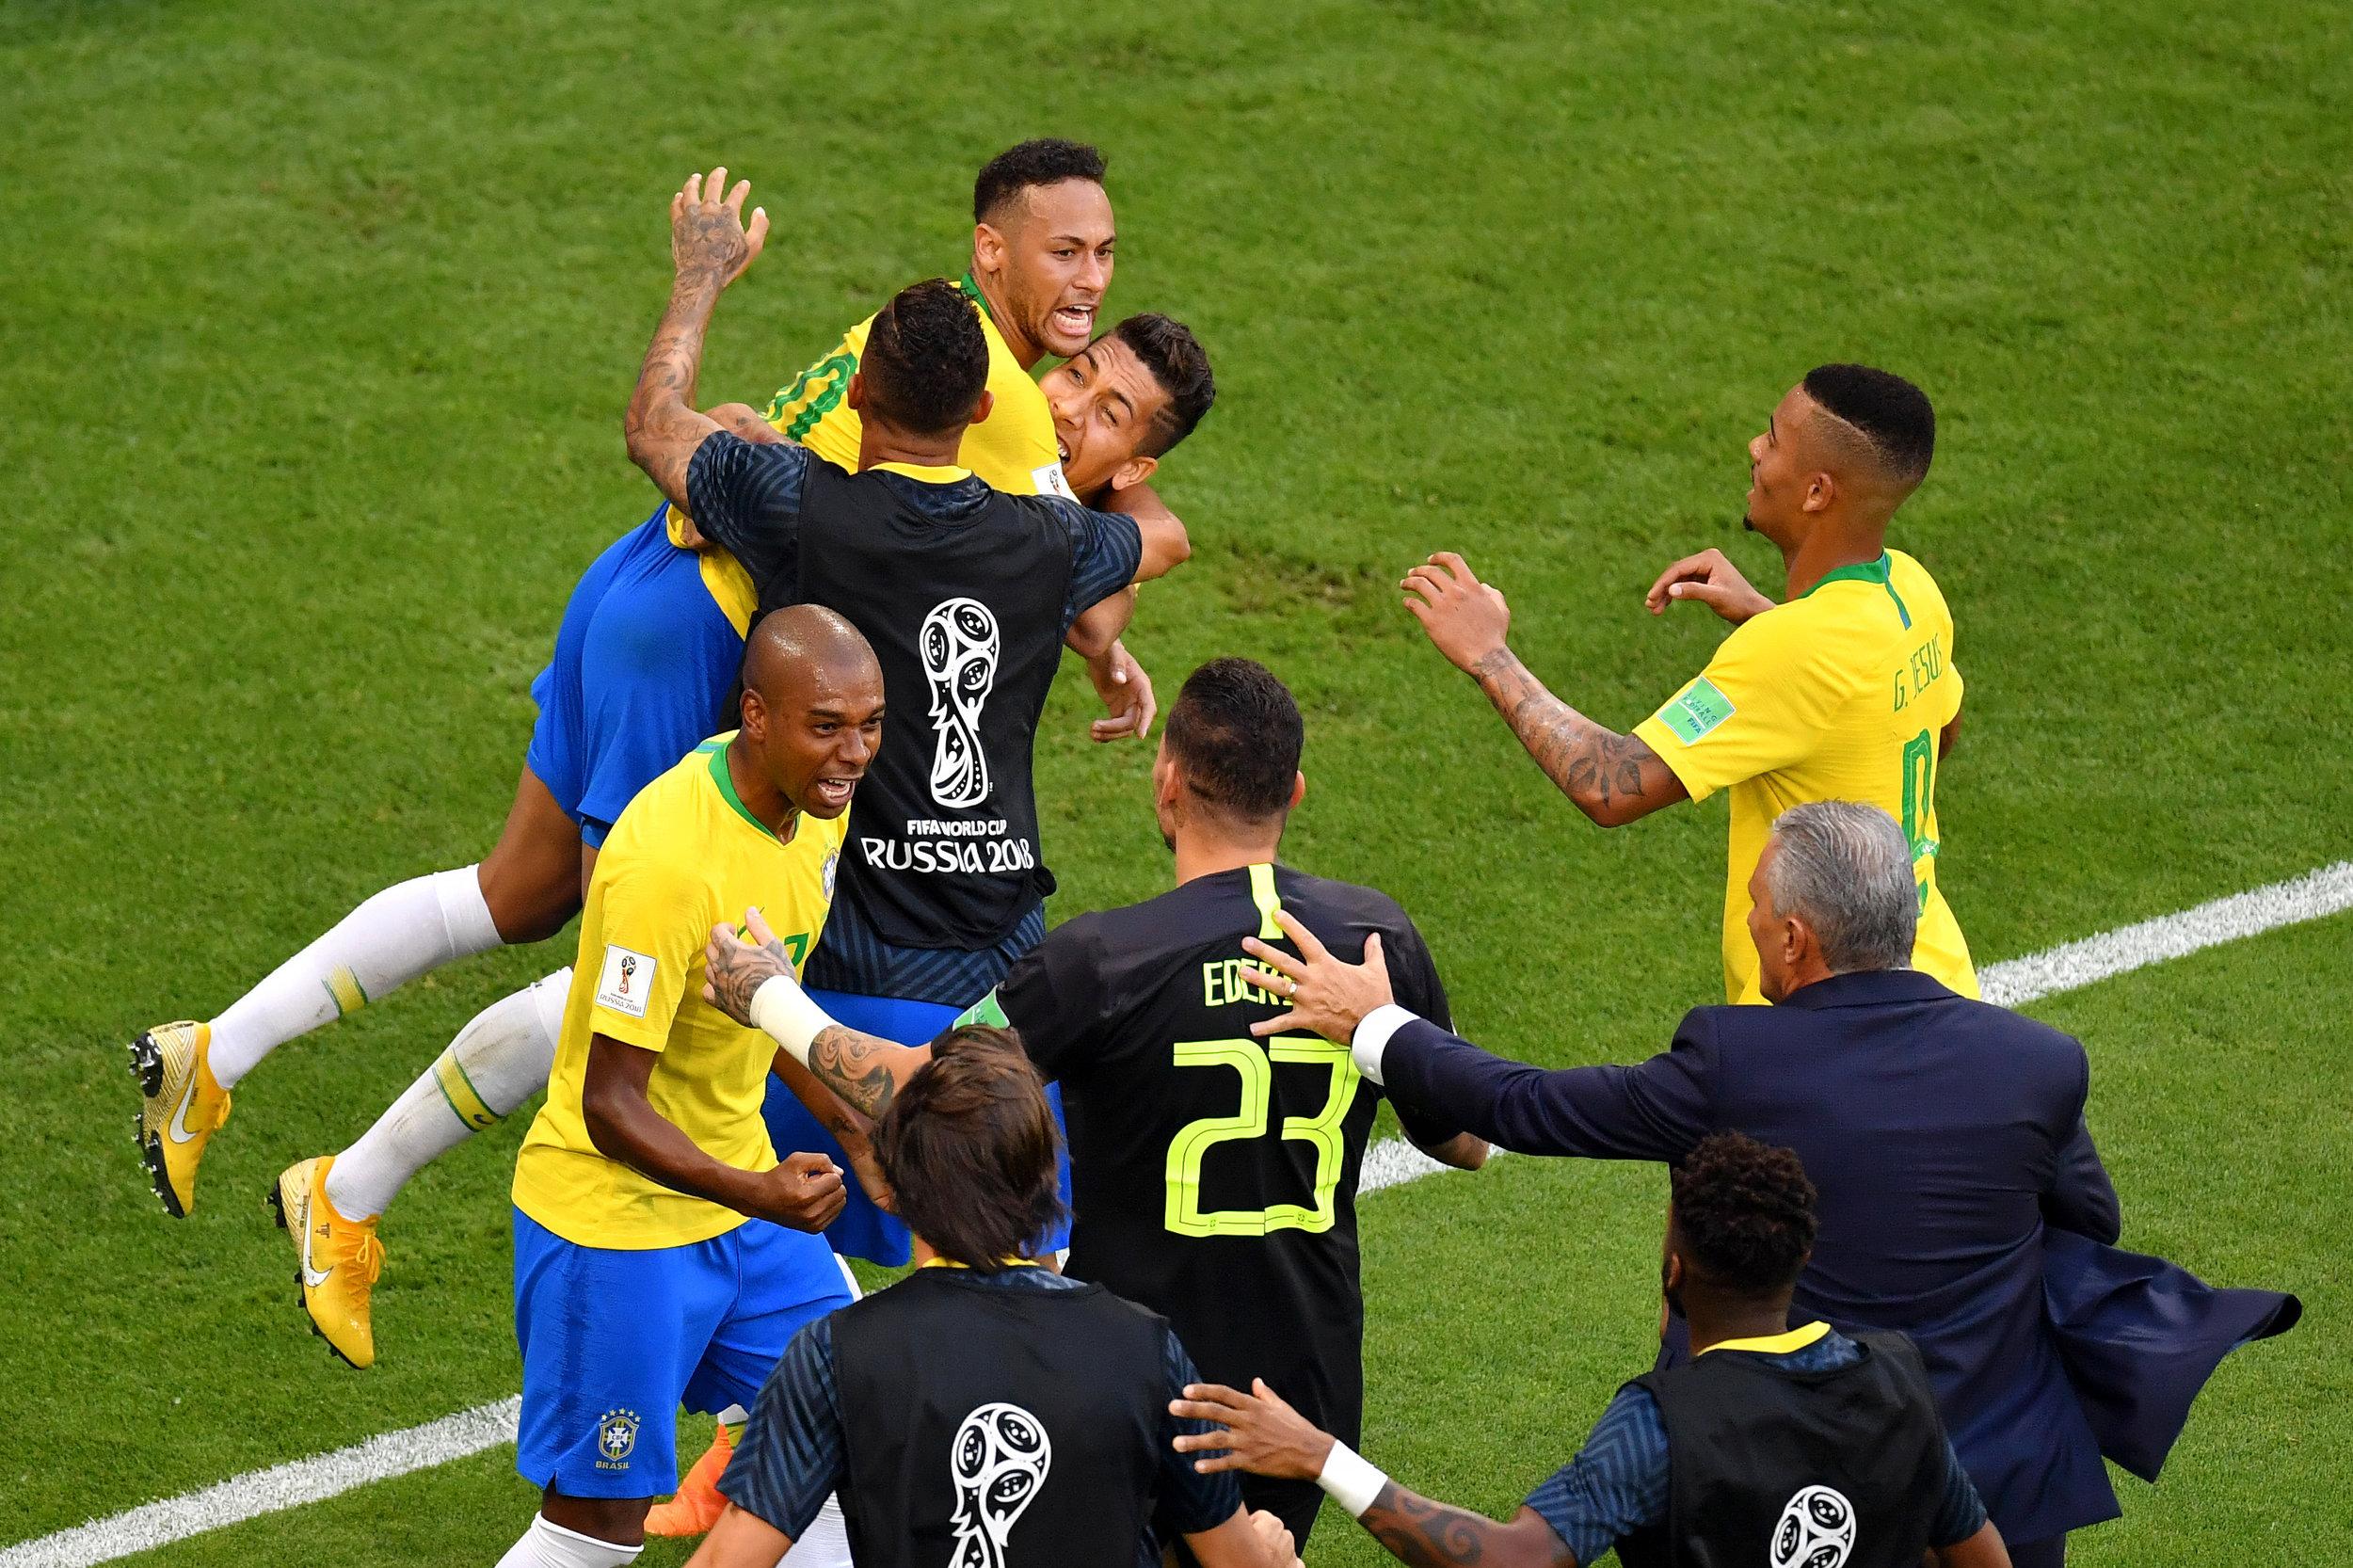 14e1d4305a3 Jul 3 VM #54: Englands store prøve og Brasilien som VM-favorit